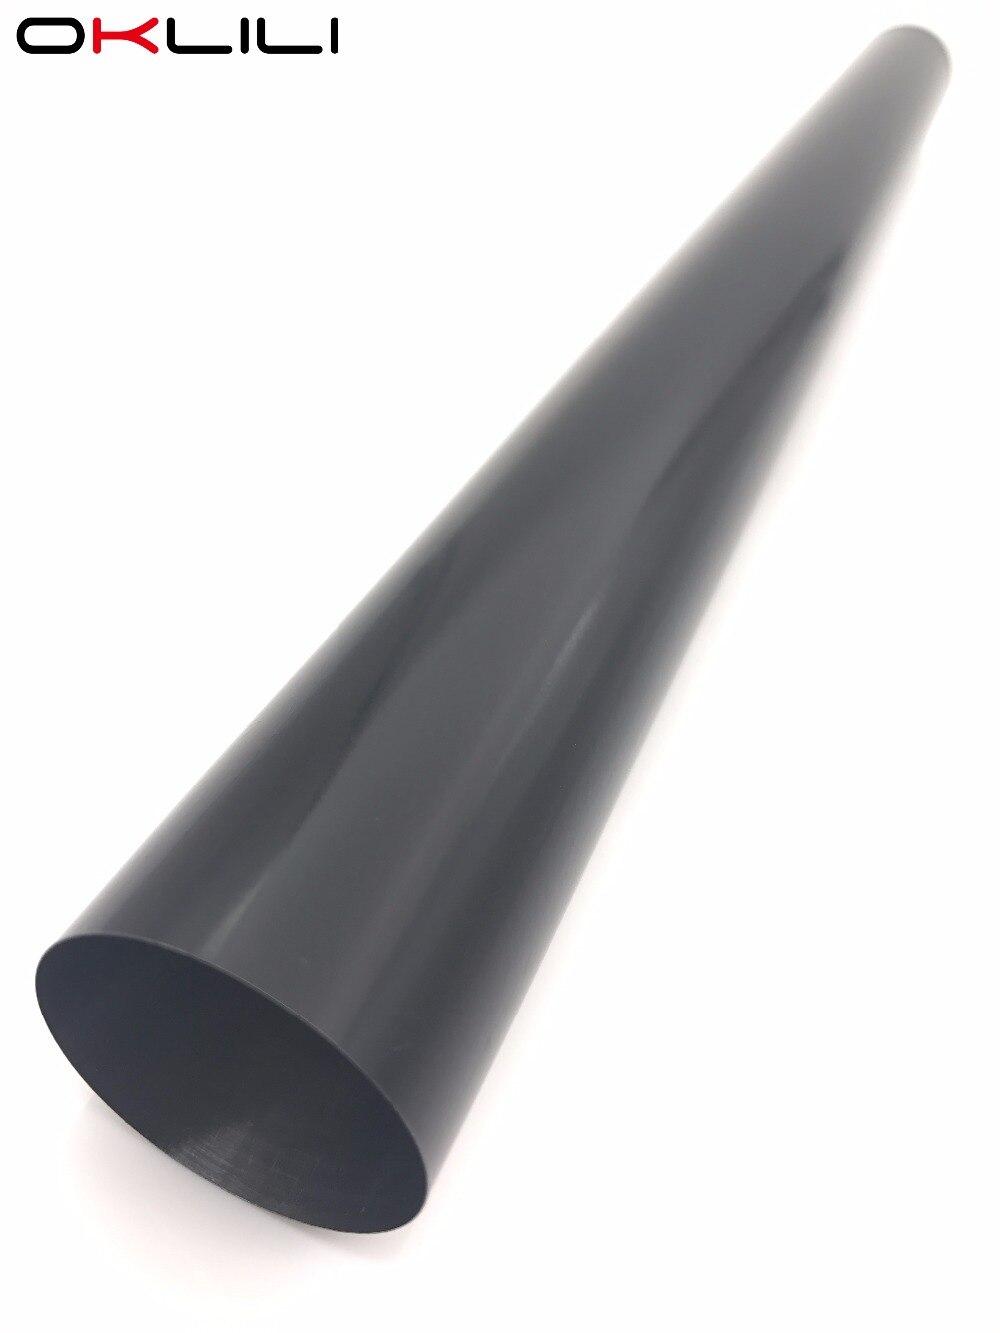 5PCX Fuser Fixing Film Sleeve for Ricoh MP C3002 C3502 C4502 C5502 C6002 SP C830 C831 MP2554 MP3054 MP3554 MP4054 MP5054 MP6054 printer fixing film for ricoh aficio mp c3002 c3502 c4502 c5502 c6002 fuser film on sale